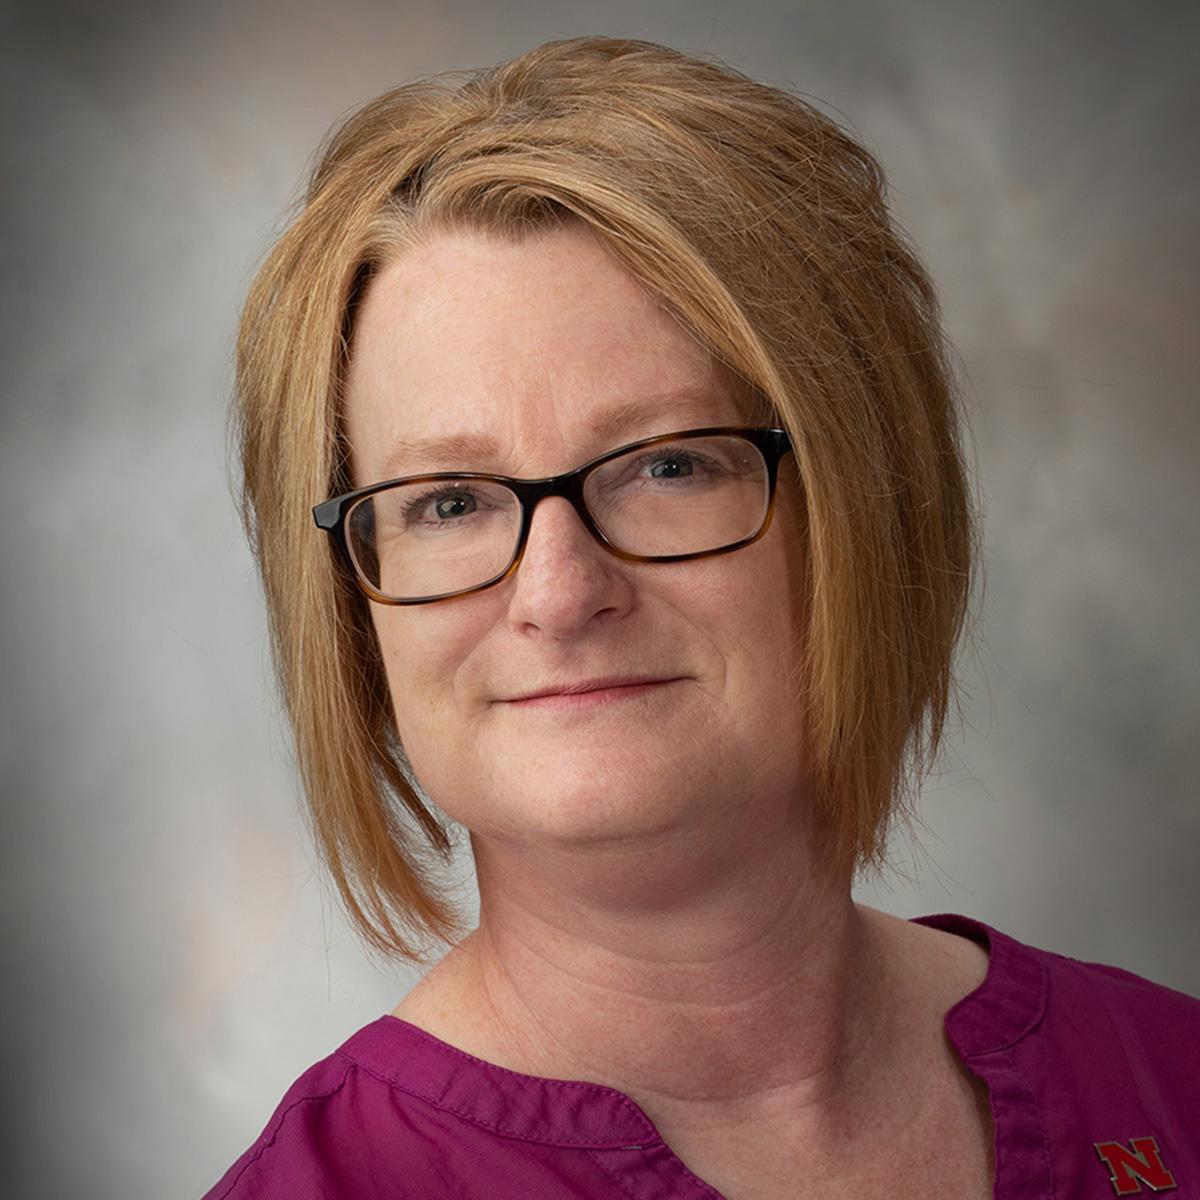 Profile picture of Andi Hallberg